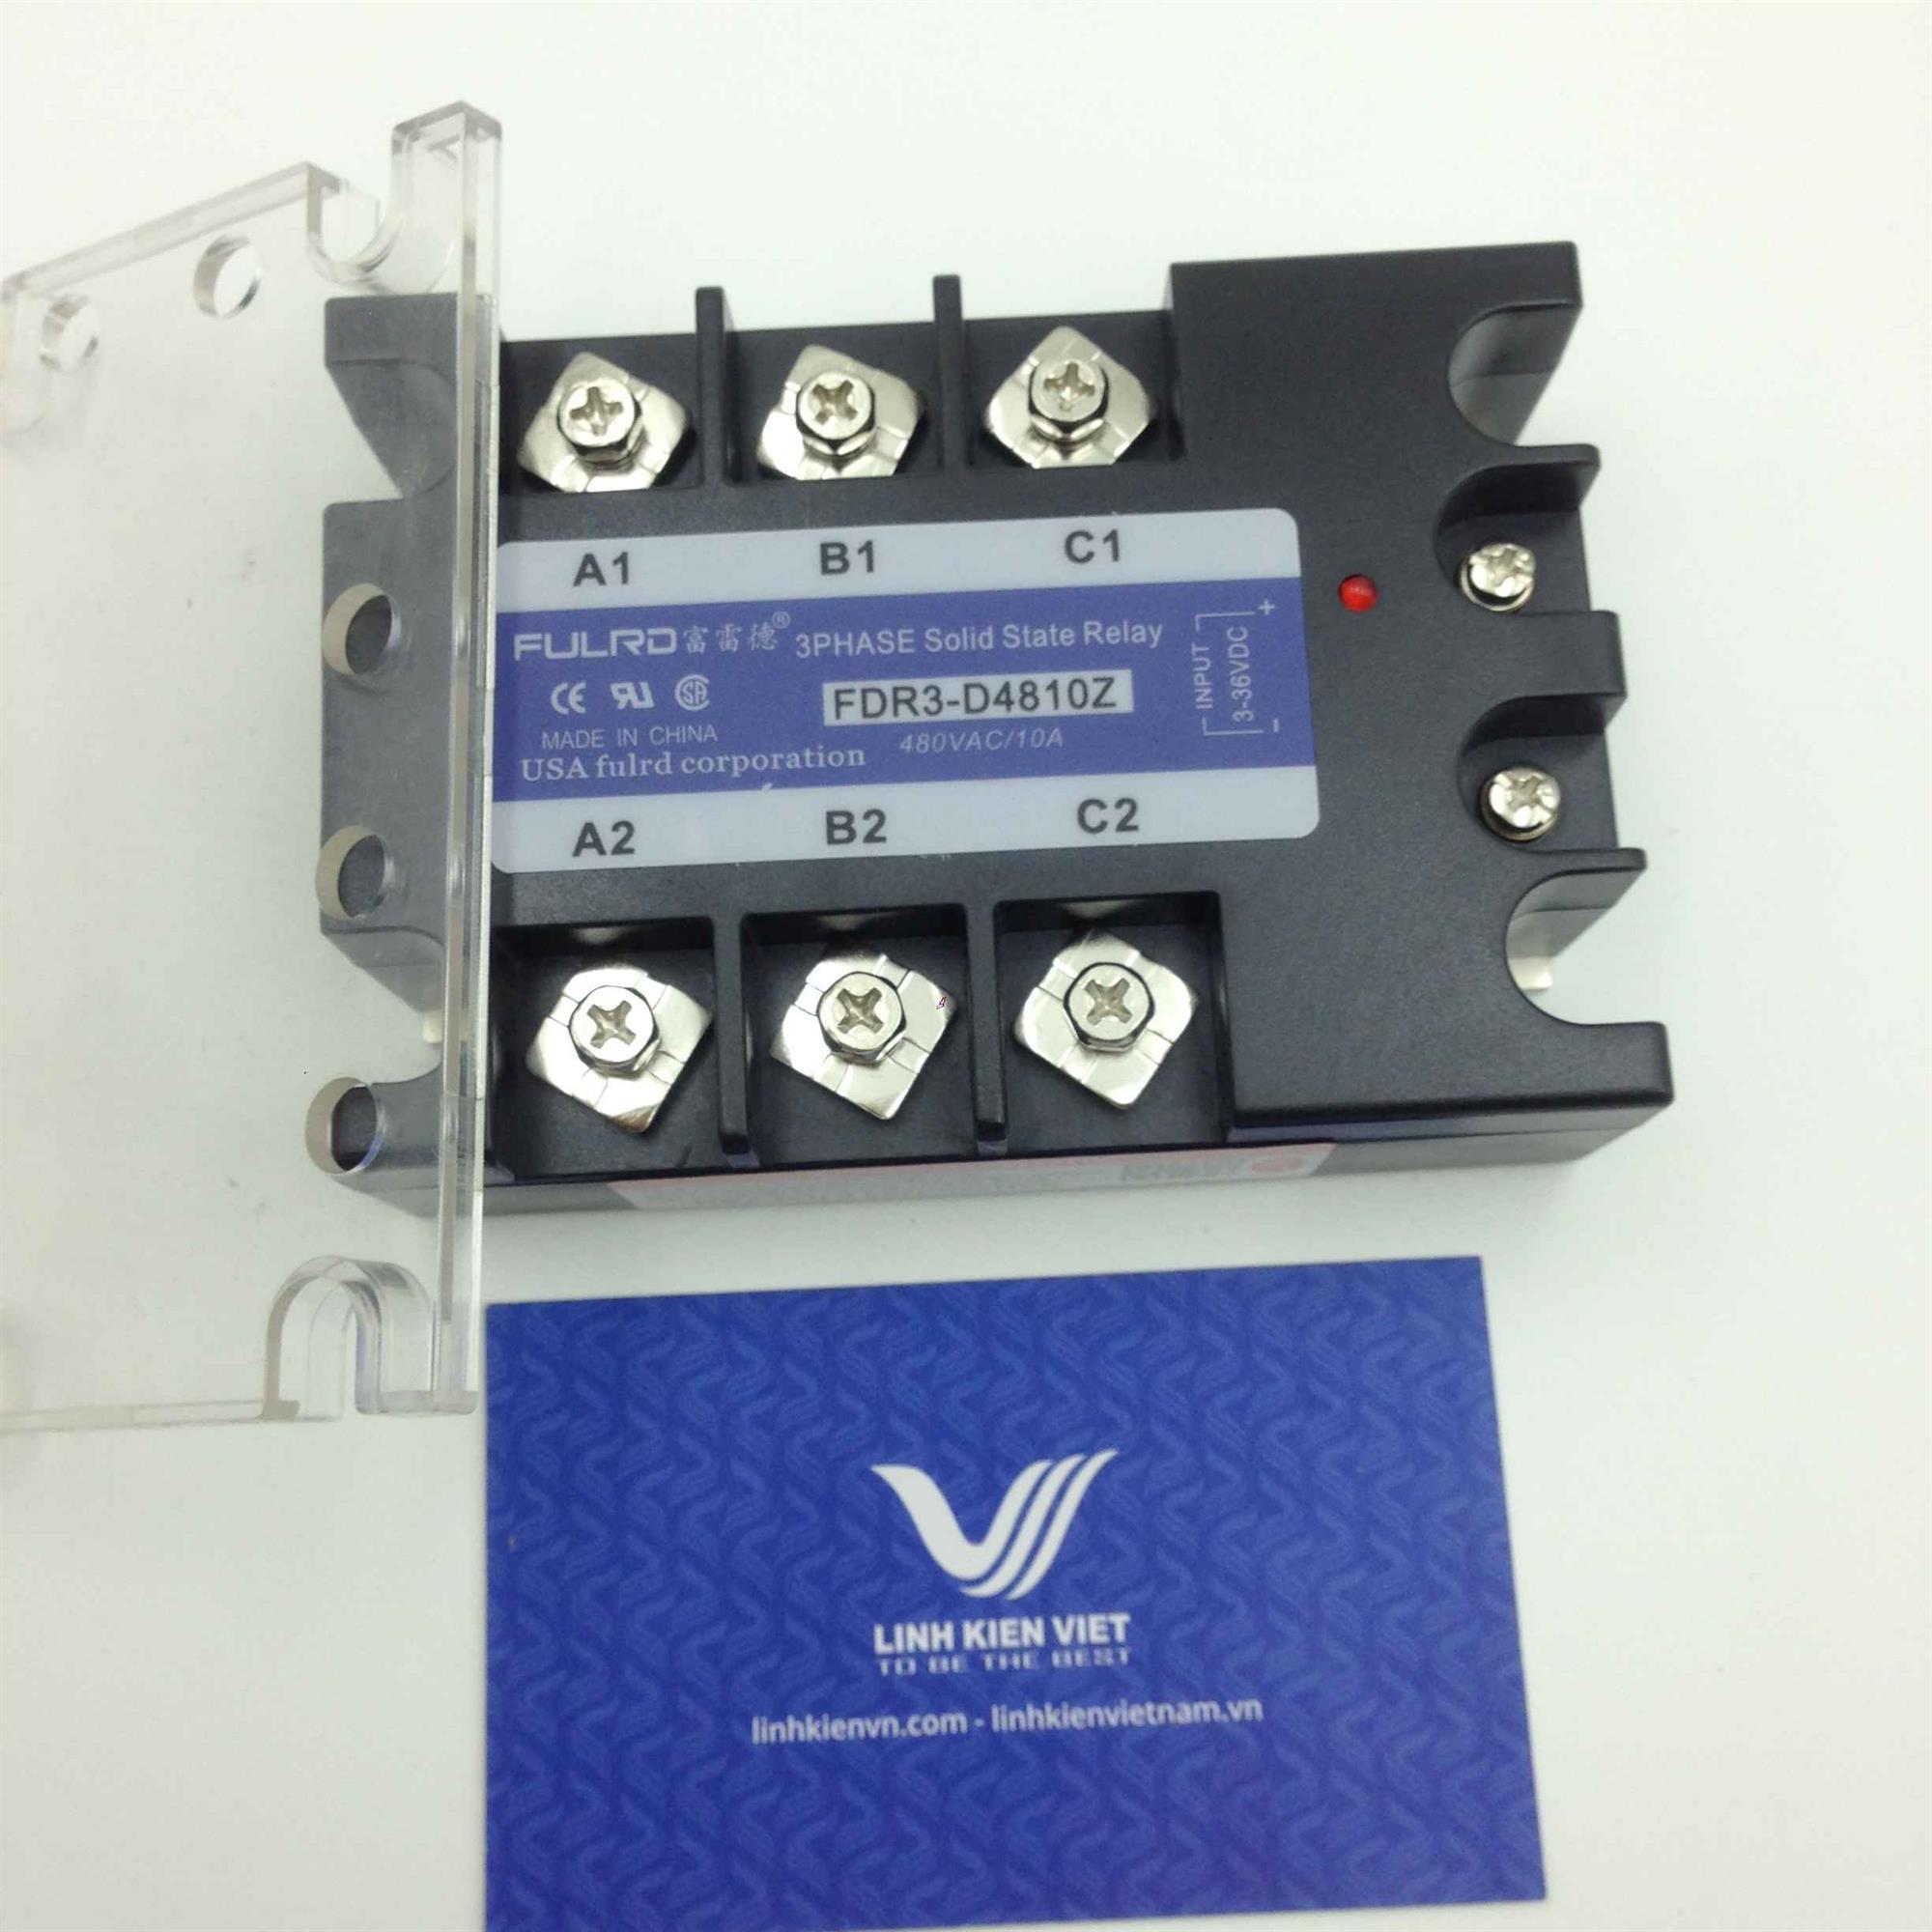 Relay bán dẫn 3 pha SSR 10A FDR3-D4810Z - (KB4H3)